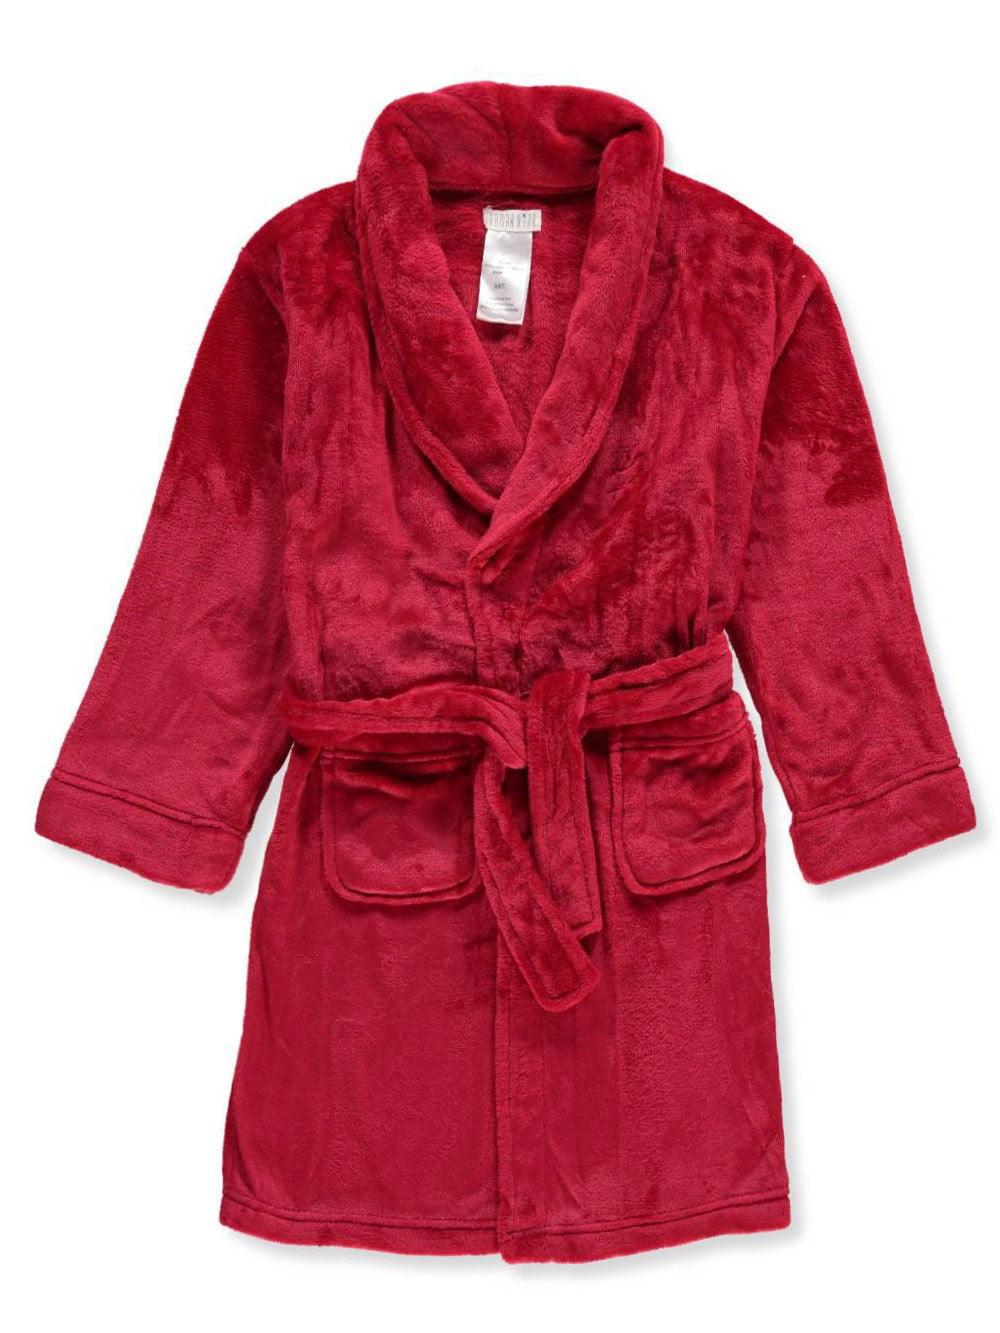 4Kidz Girls Sequin Patch Plush Fleece Dressing Gown Robe